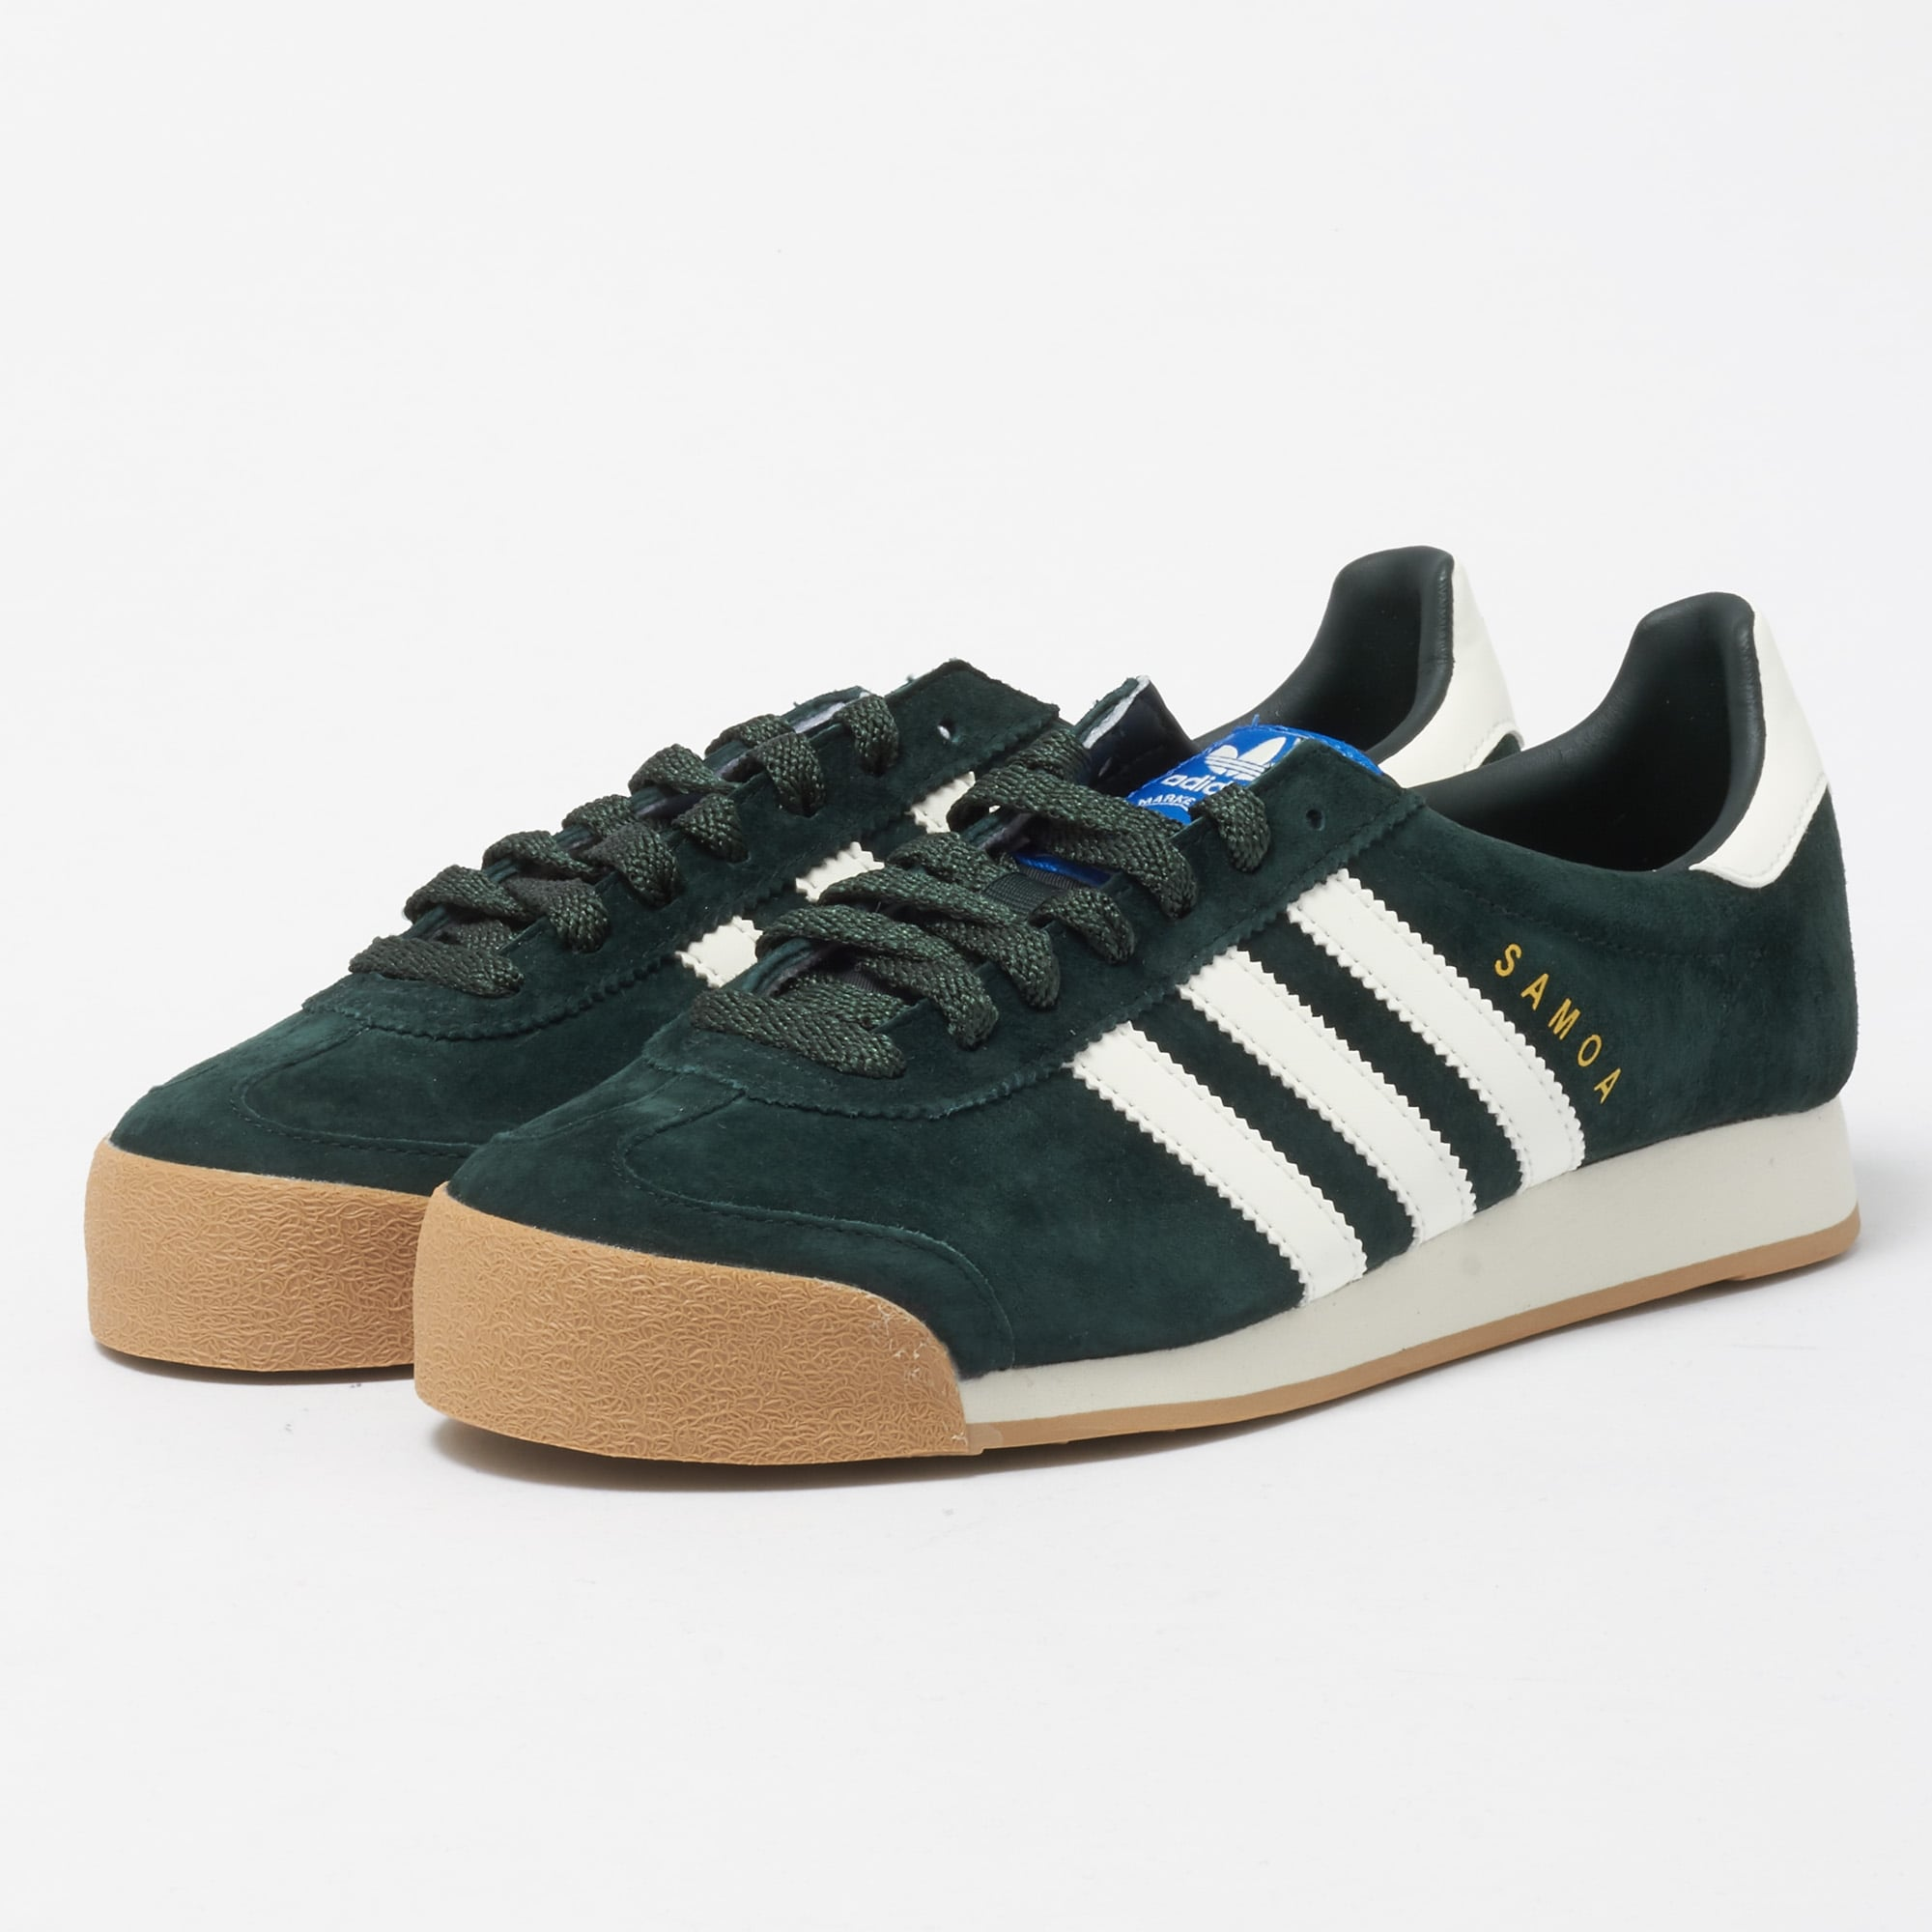 samoa adidas green